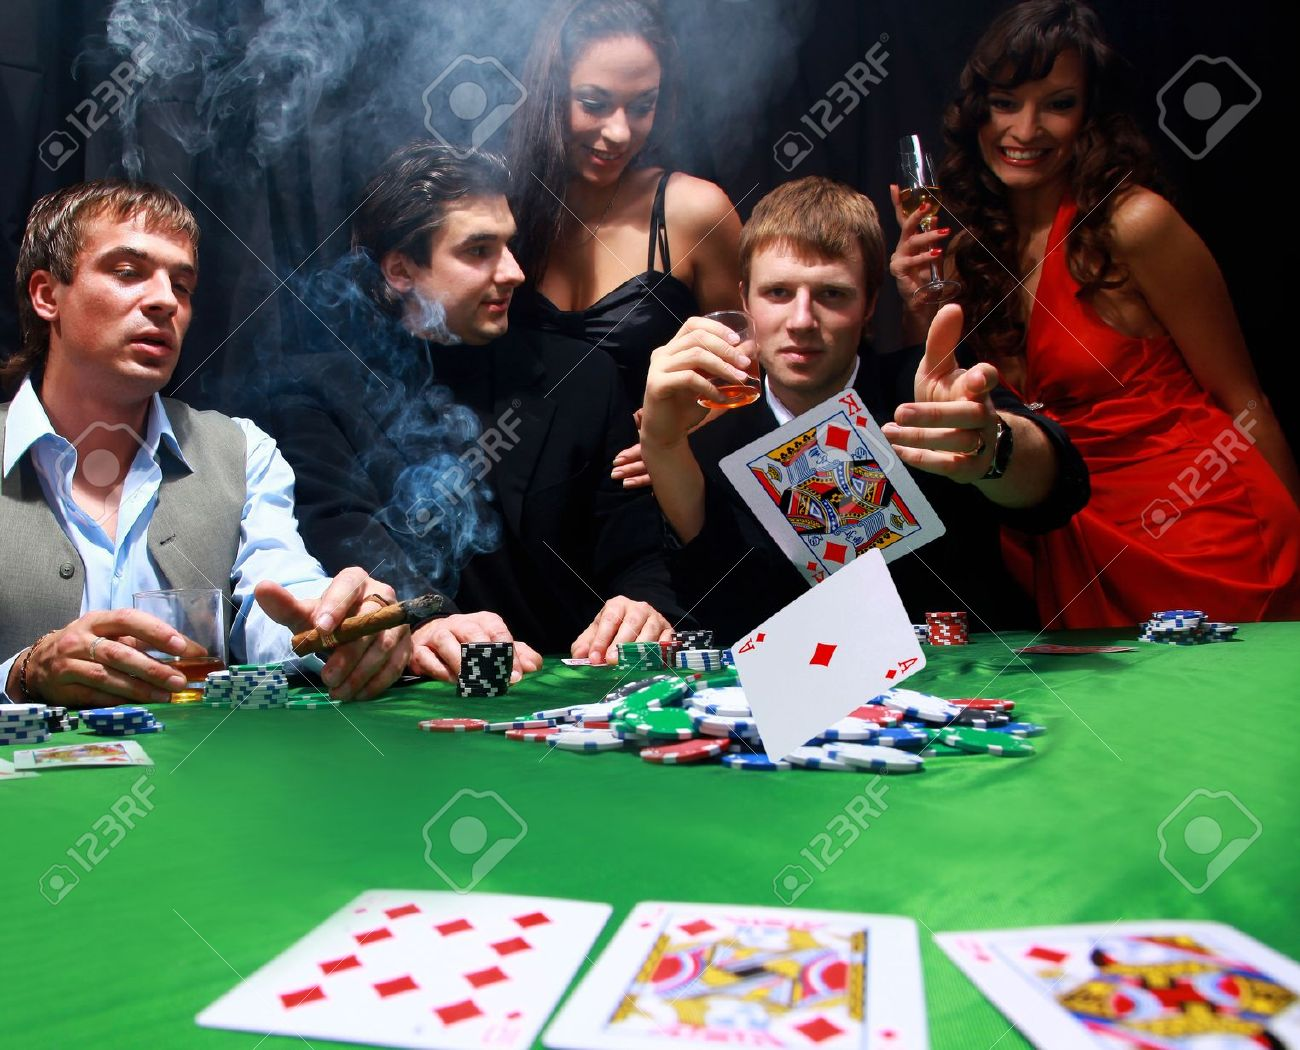 Casino las poker vegas new mgm casino in